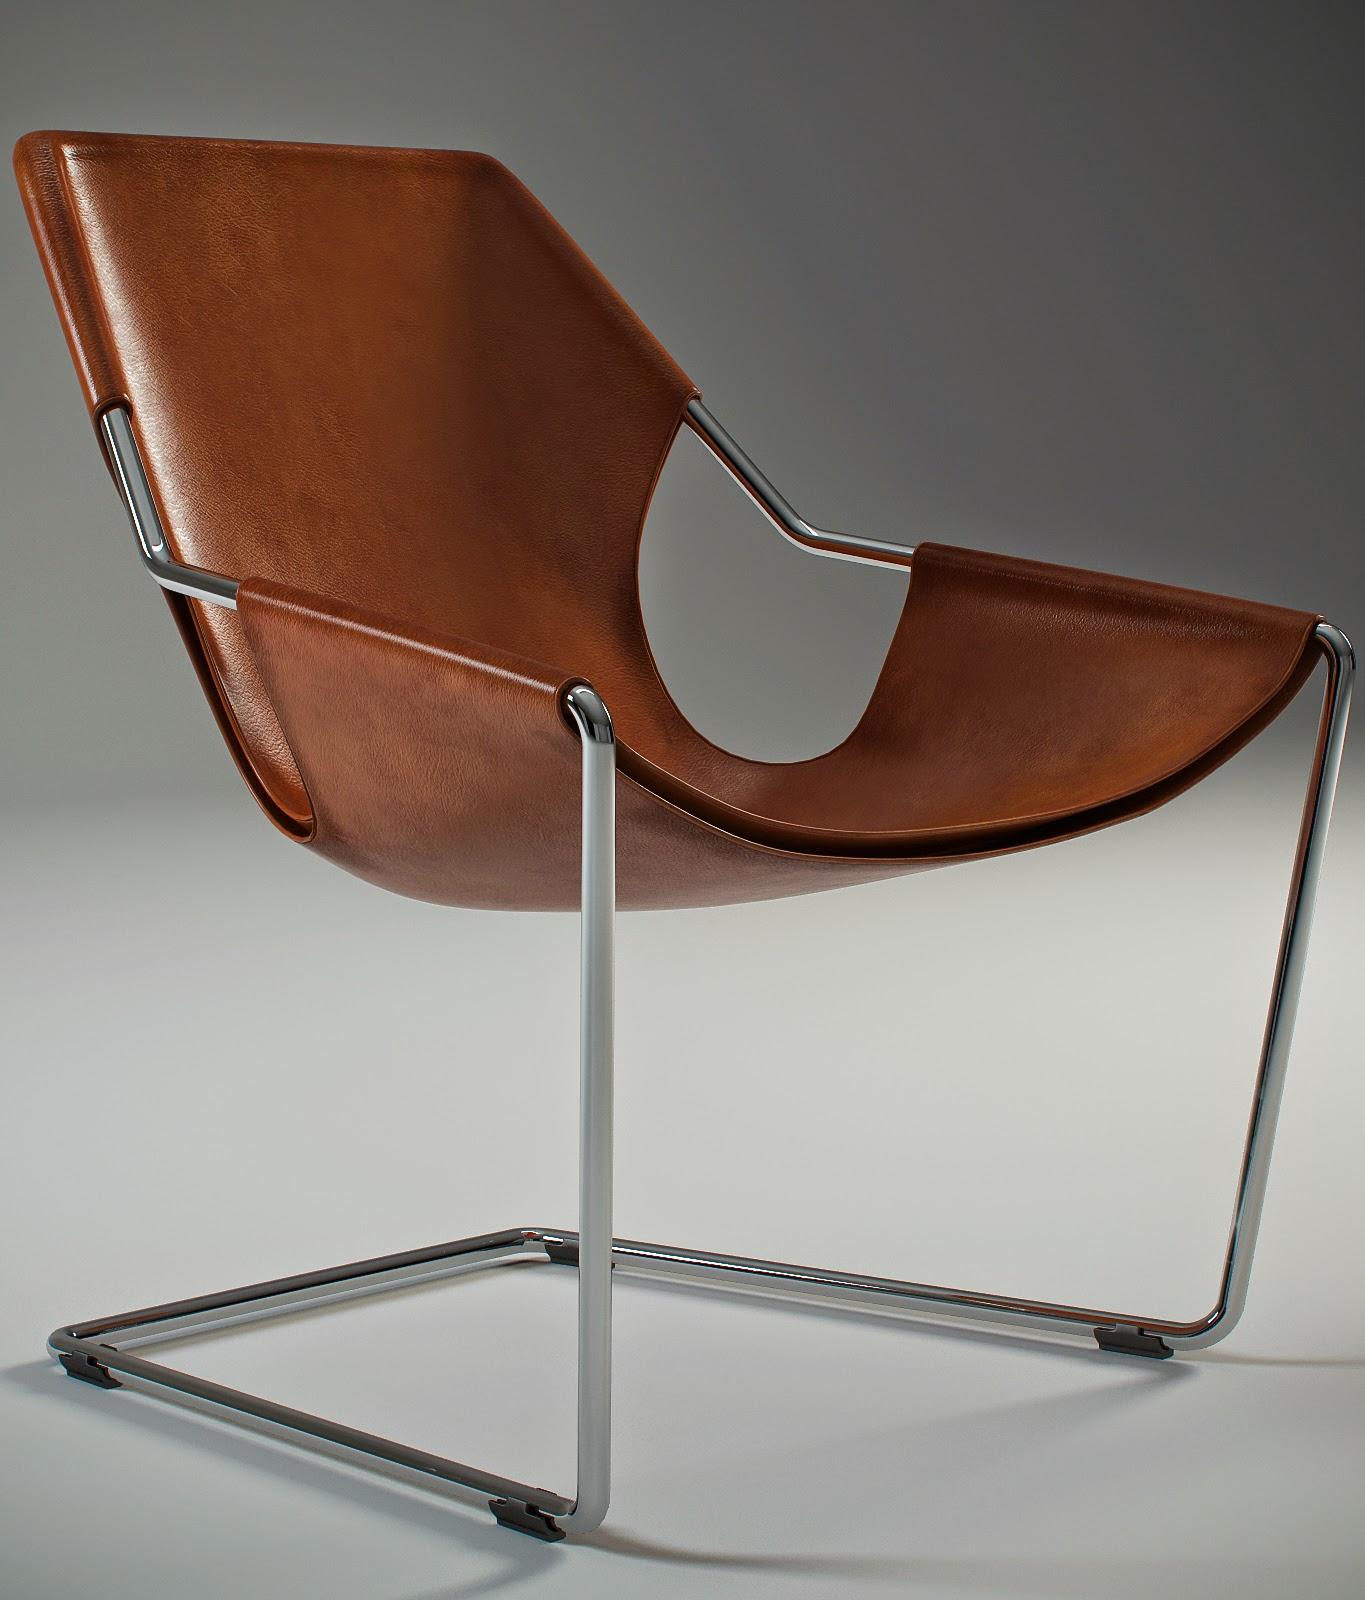 Paulistano Lounge Chair By Paulo Mendes Da Rocha Cararaviz